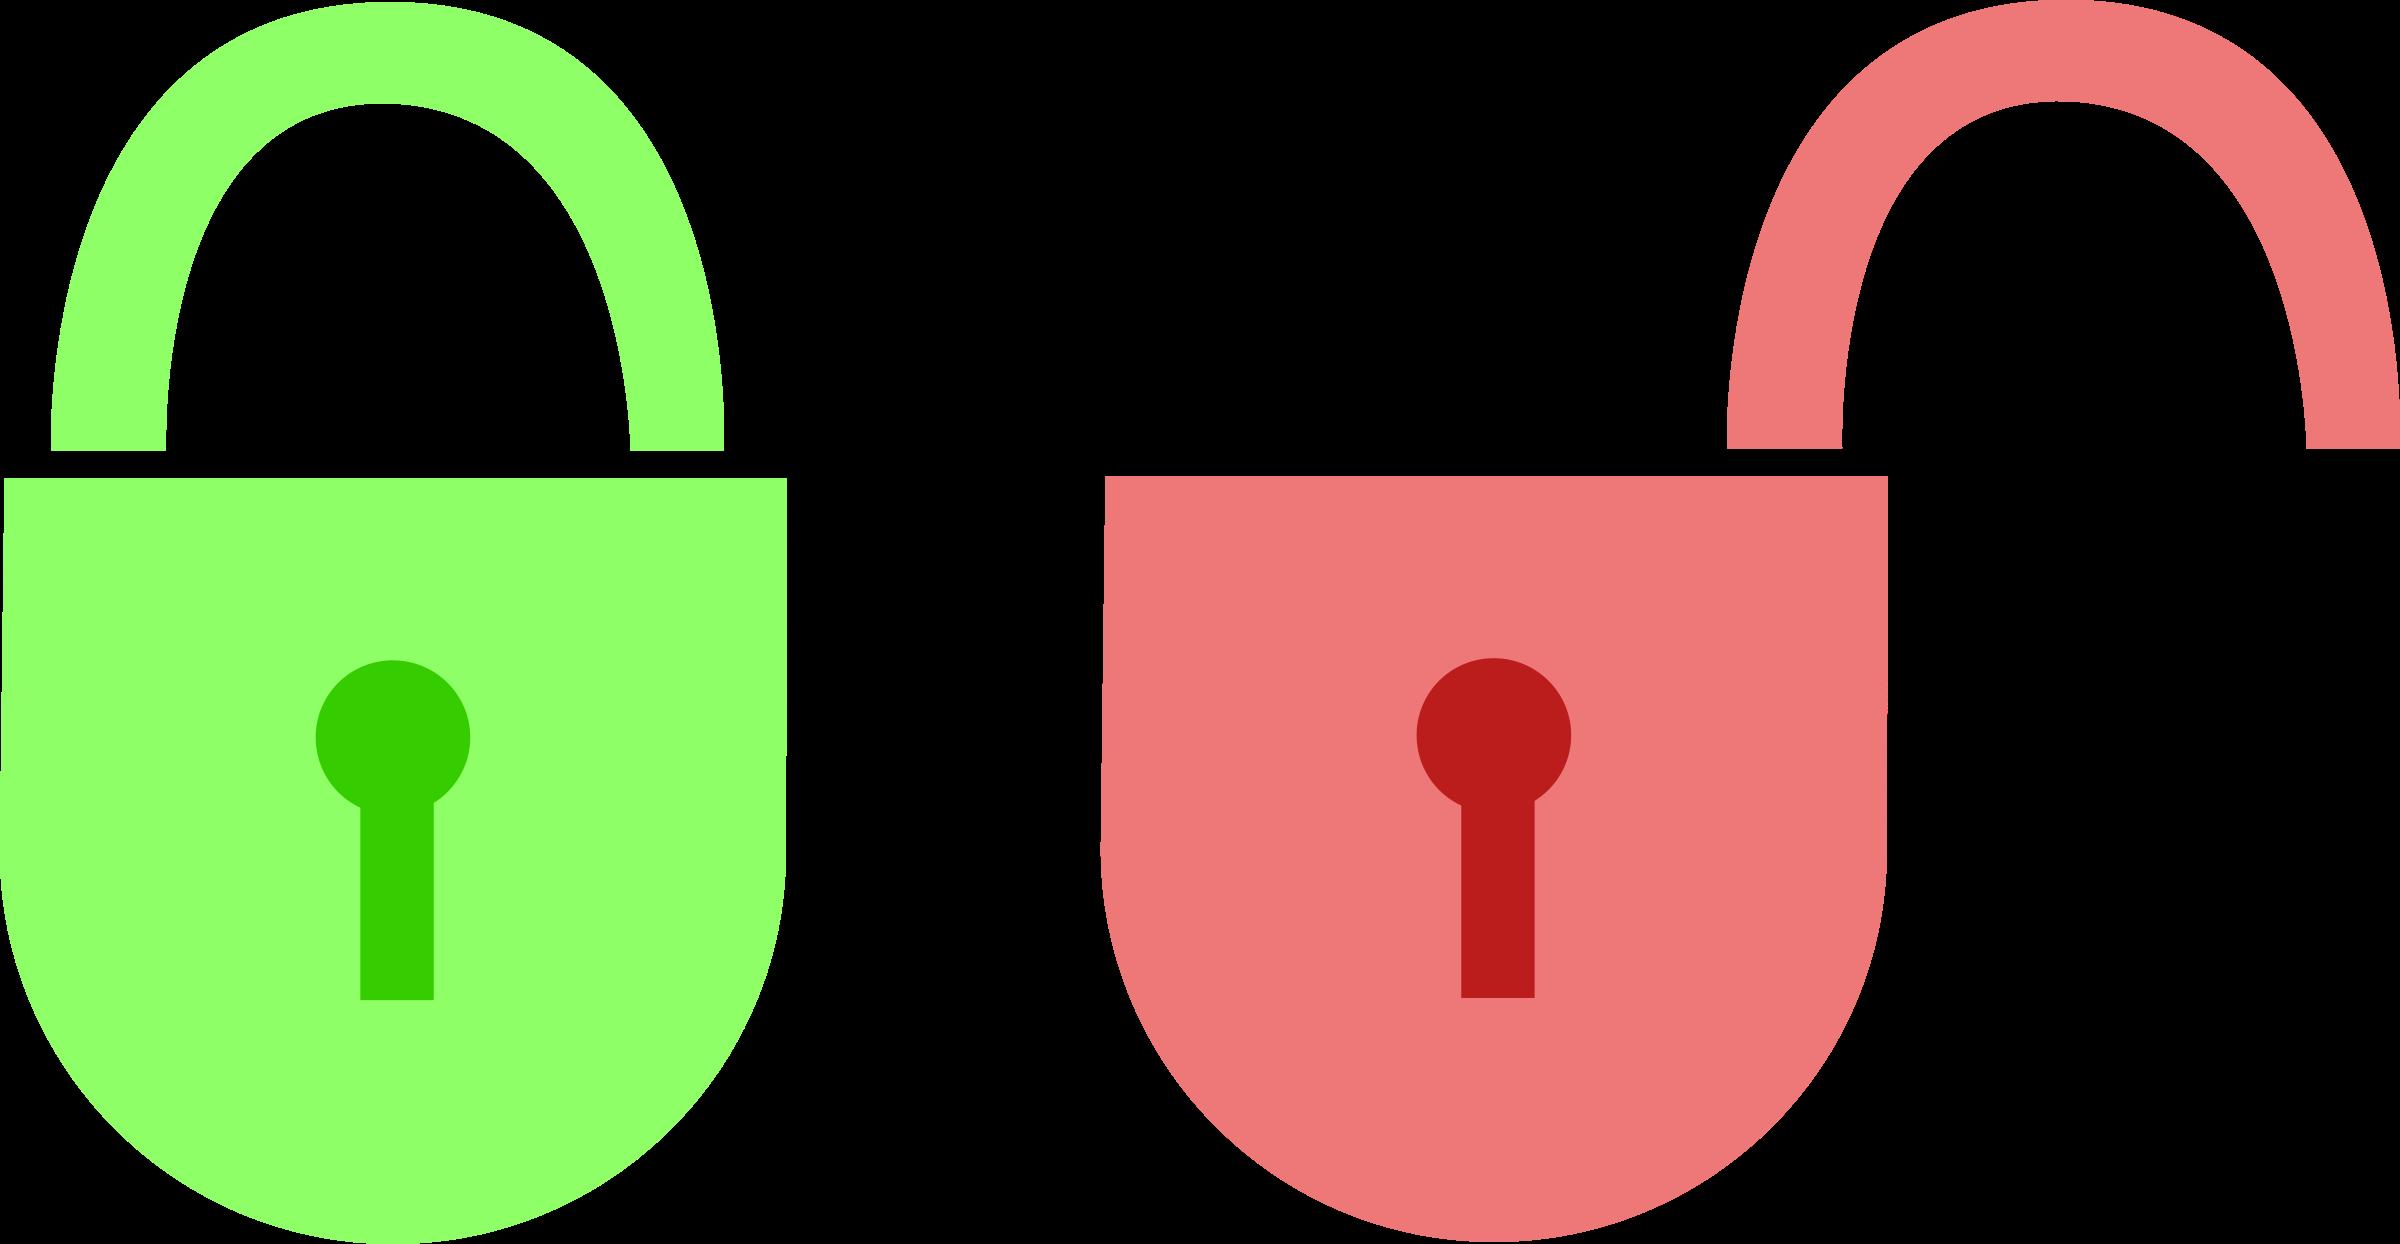 Free Unlocked Lock Cliparts, Download Free Clip Art, Free.